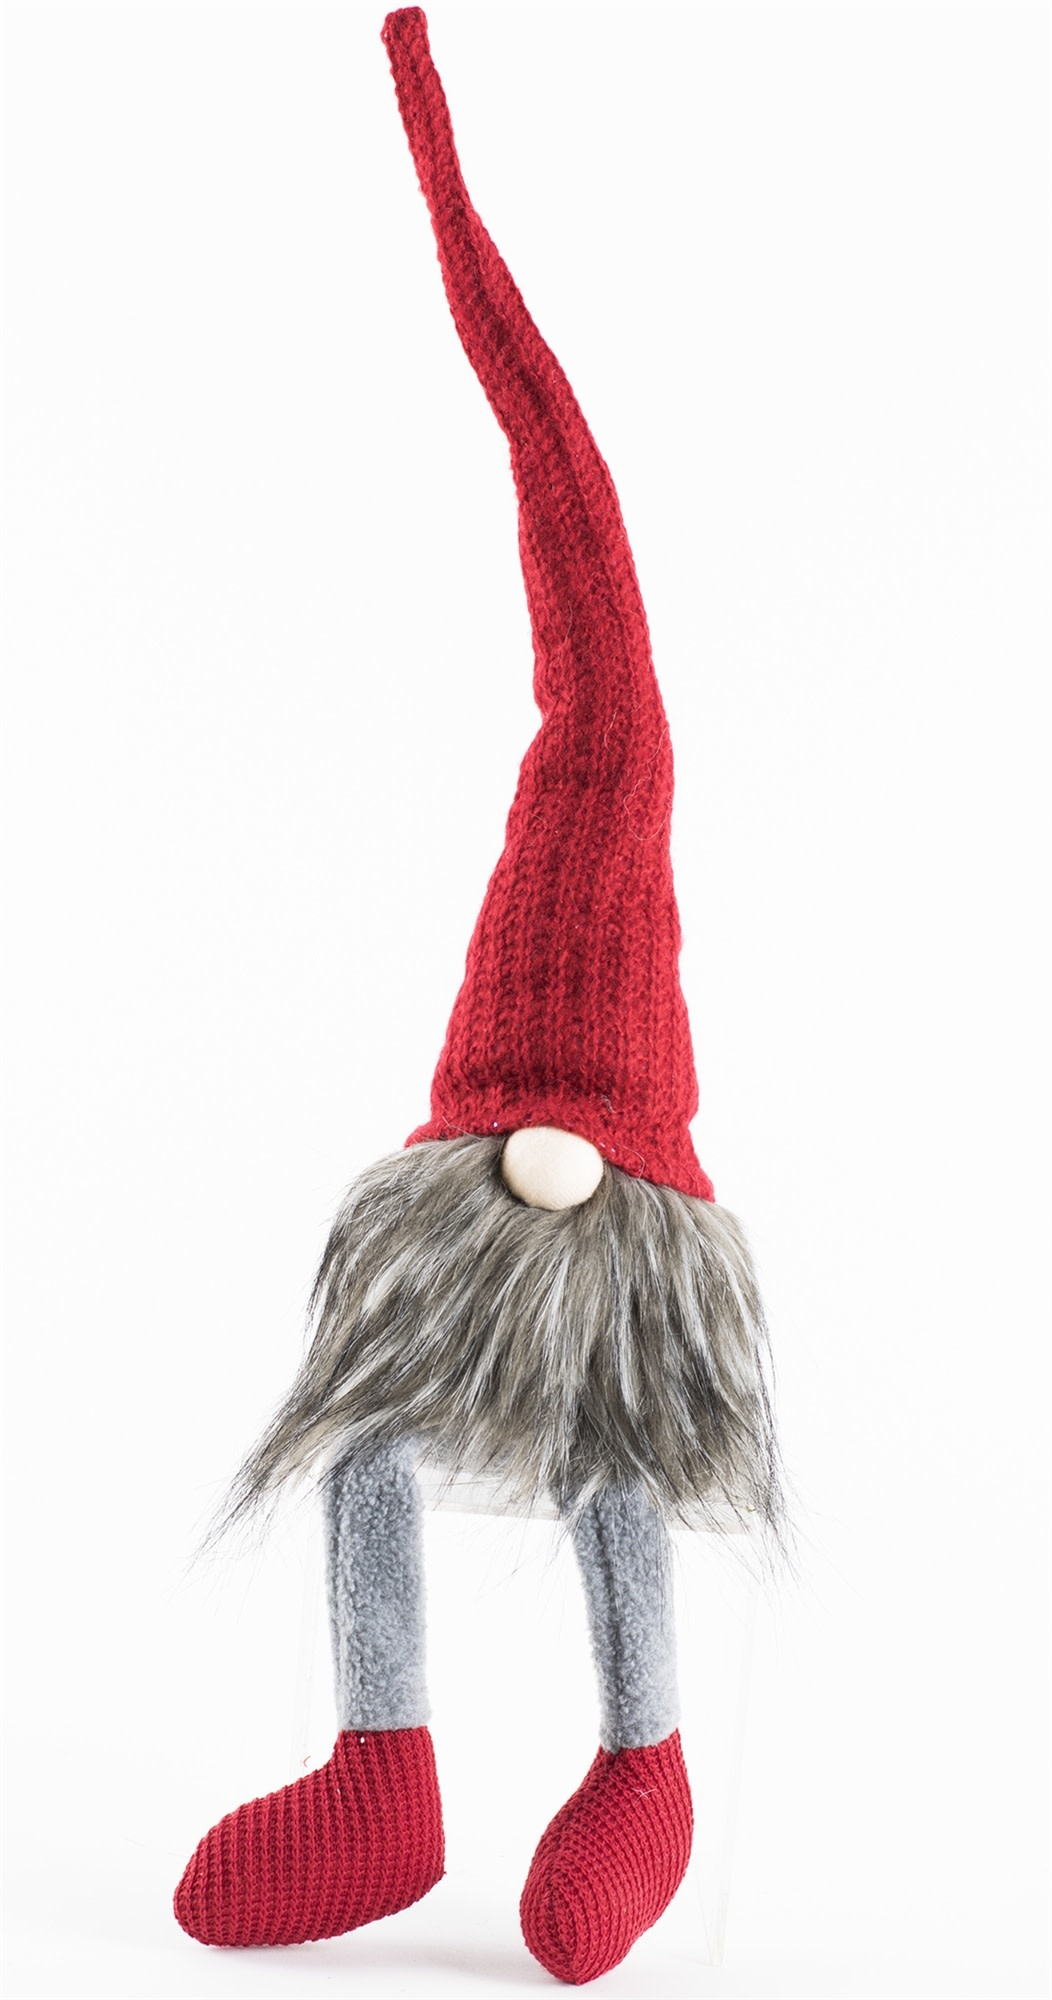 Harry Tall Hat Gnome Shelf Sitter